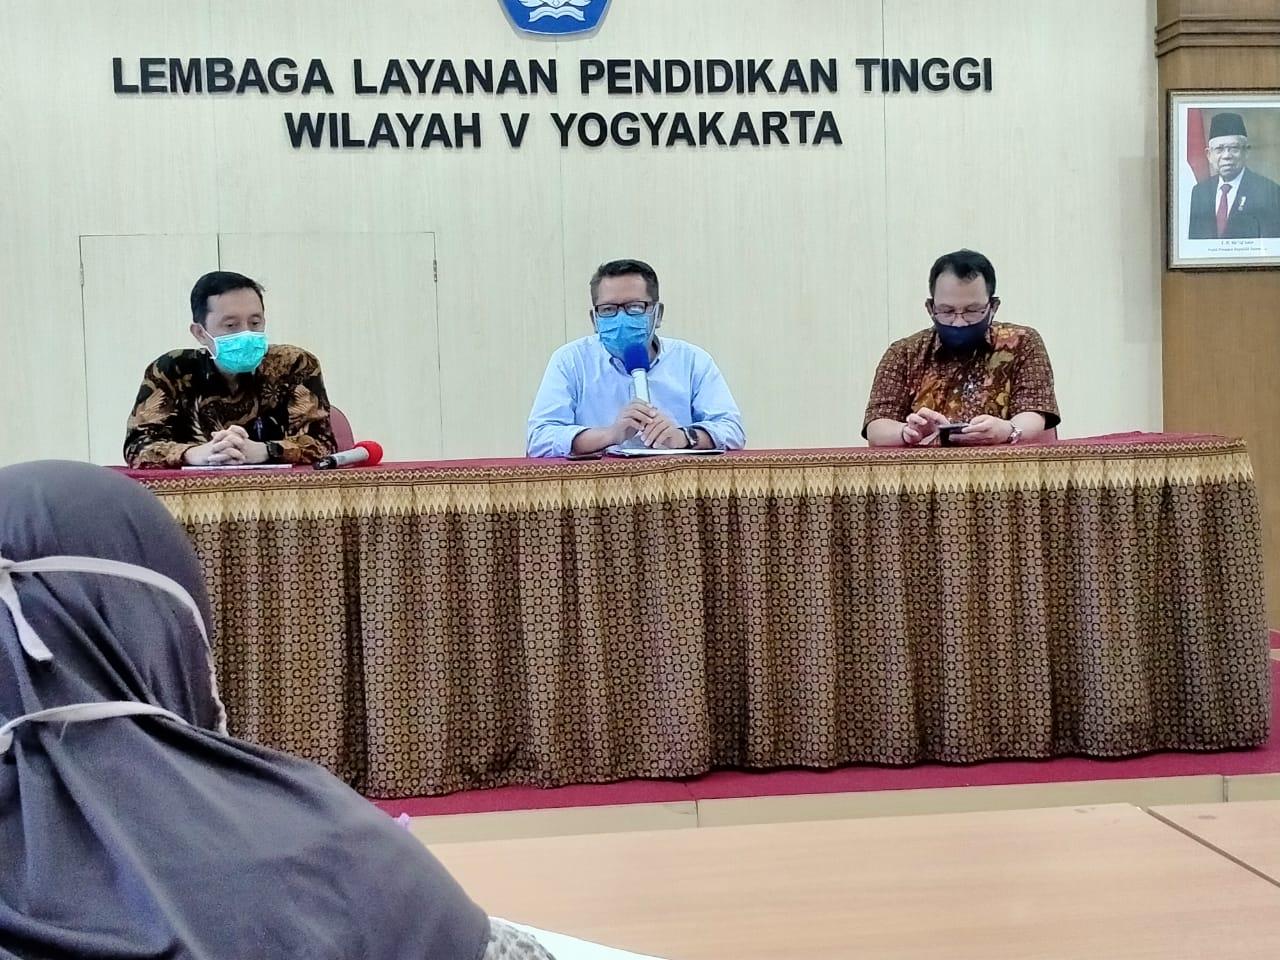 Daftar PTS di Yogyakarta Lewat Jogjaversitas.id